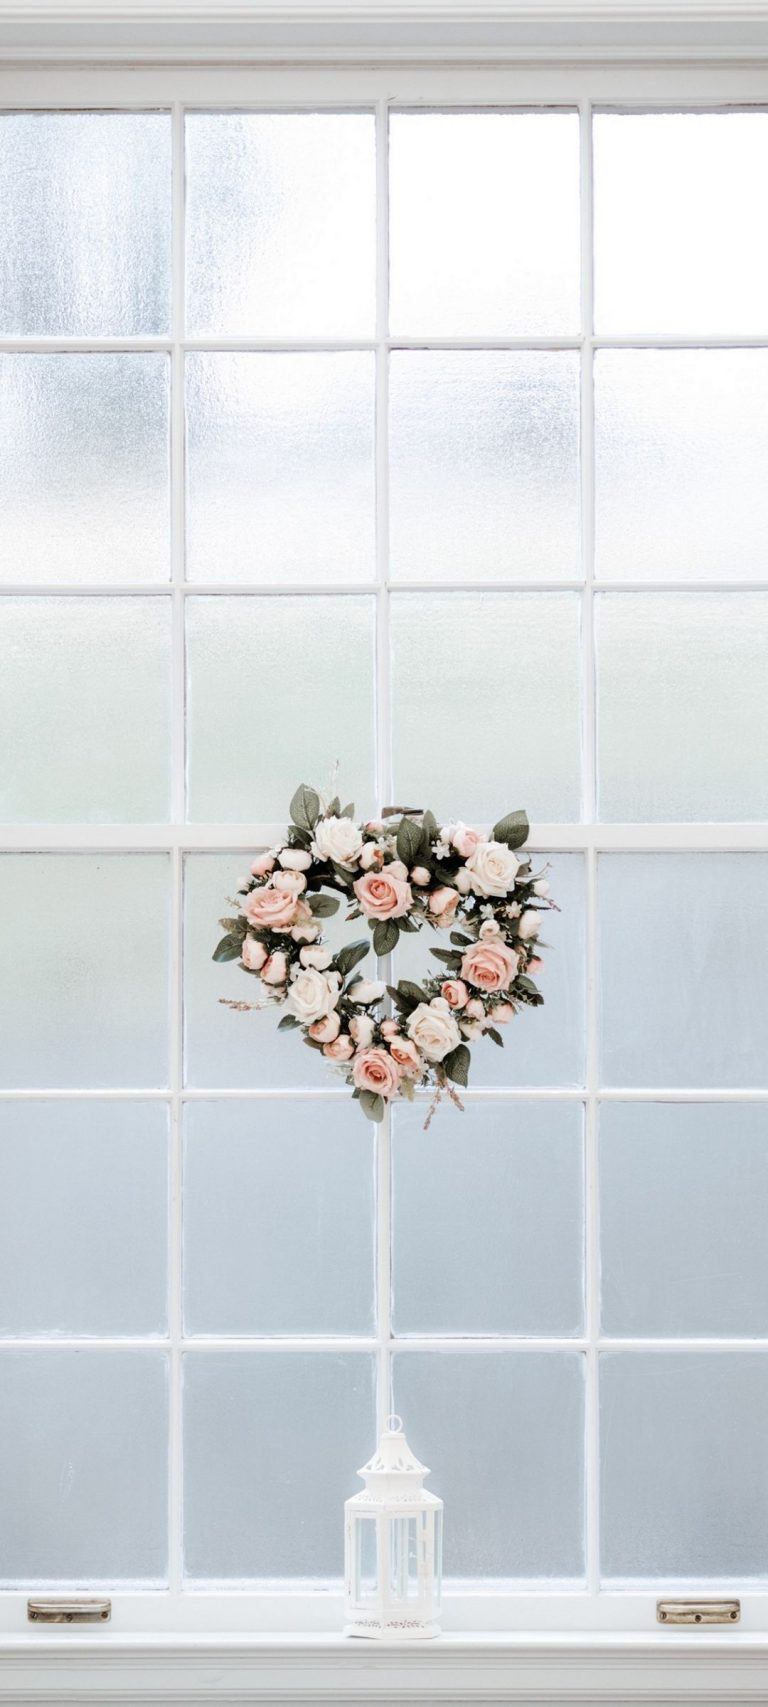 Window Love Hearts 1080x2400 768x1707